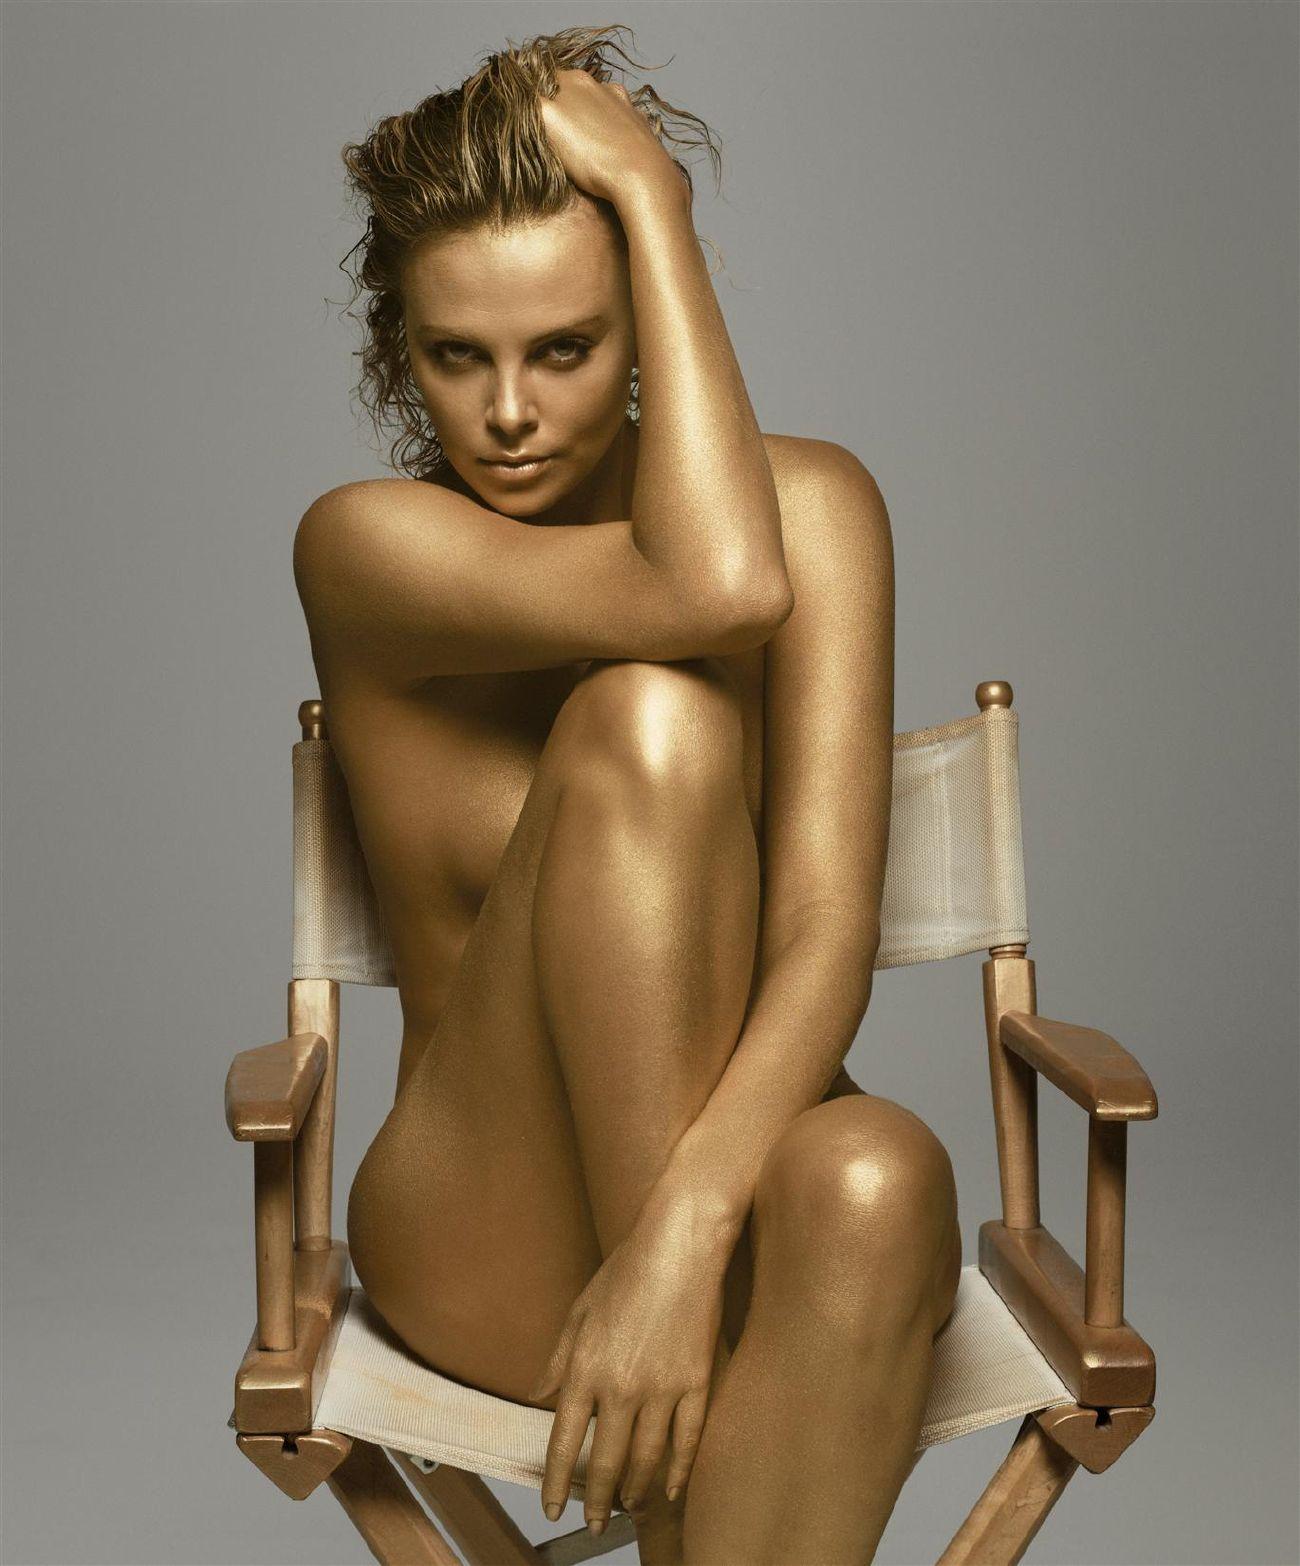 http://2.bp.blogspot.com/-cOxVJbWYR5I/ThGwVAYAFoI/AAAAAAAABZU/9wVH4KeF6zM/s1600/charlize-theron-nude-telanjang-ML62.jpg